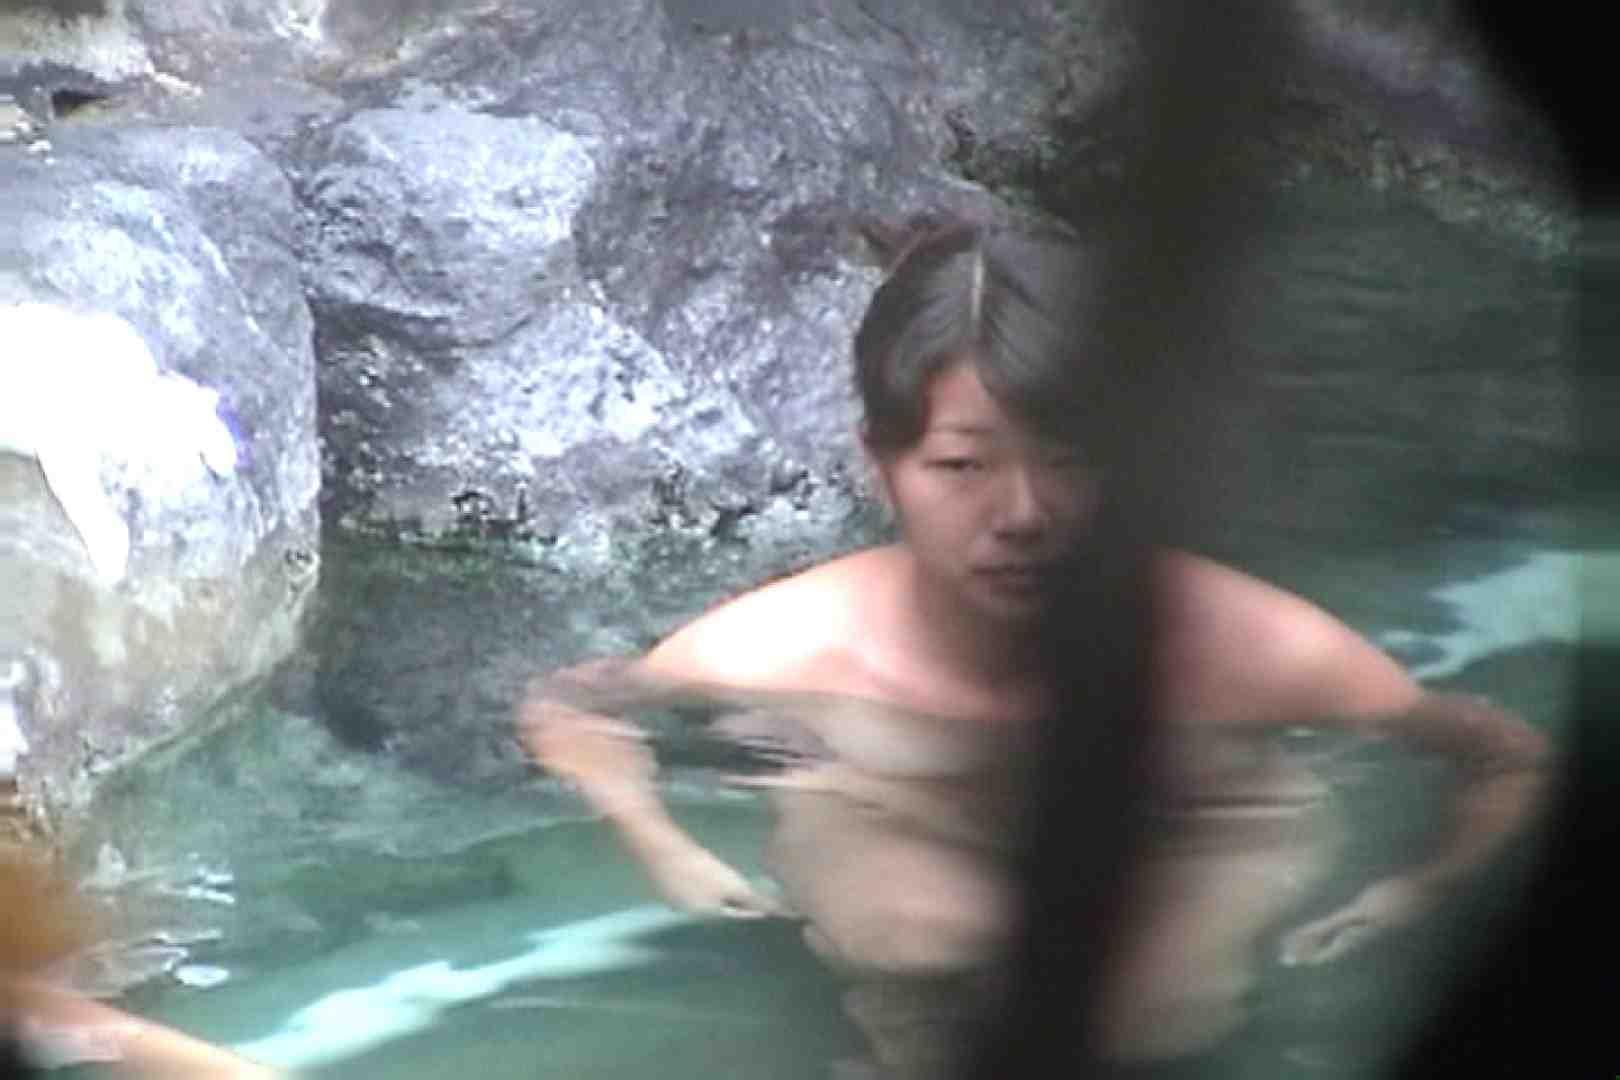 Aquaな露天風呂Vol.69【VIP限定】 OLのエロ生活   露天風呂  106連発 28